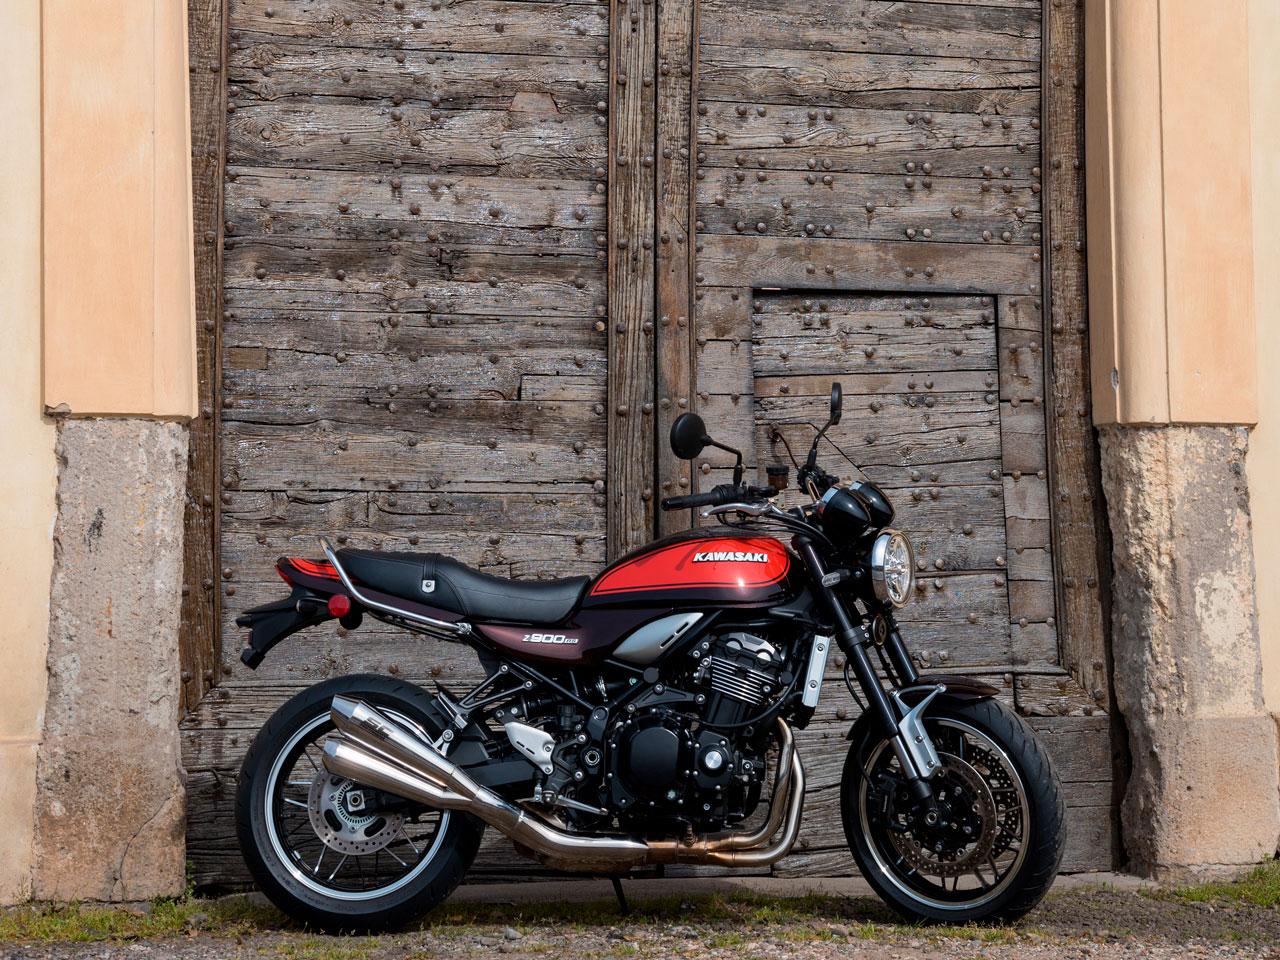 Kawasaki-Z900RS-Testanera-Esterna2_1280x960px_Web